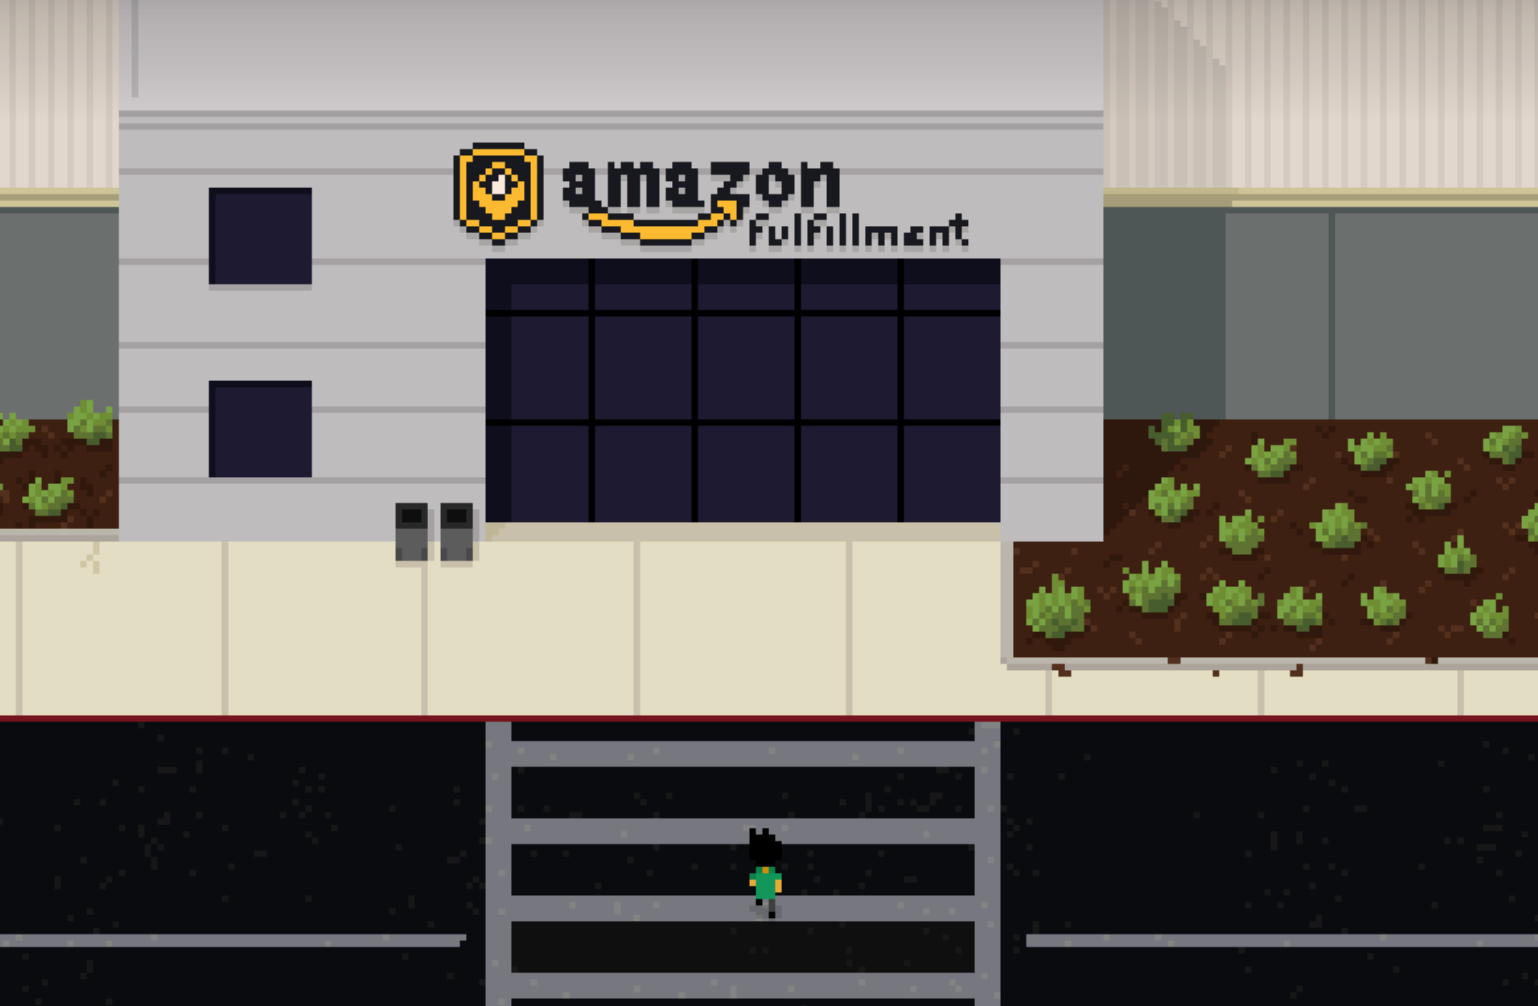 amazon fulfillment worker game